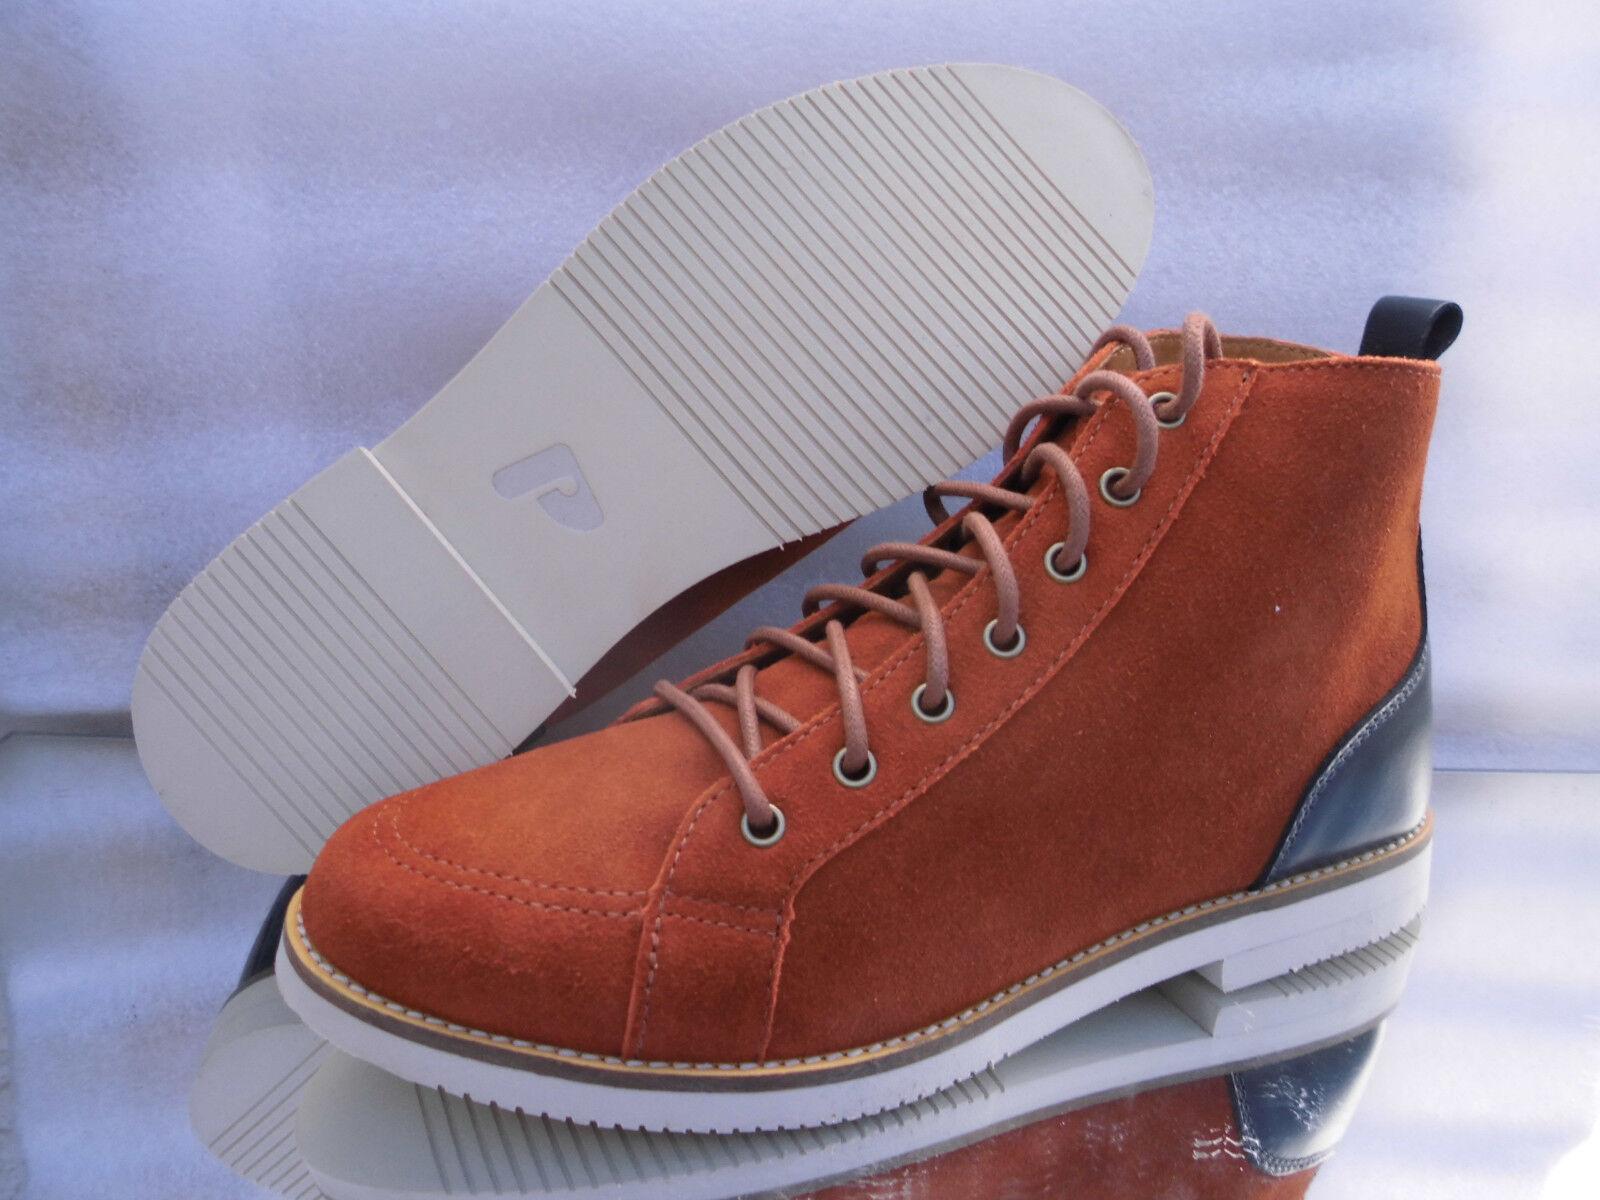 POINTER FRBN LederSchuhe/Stiefel Boots Farbe:Butumn & Black Neu